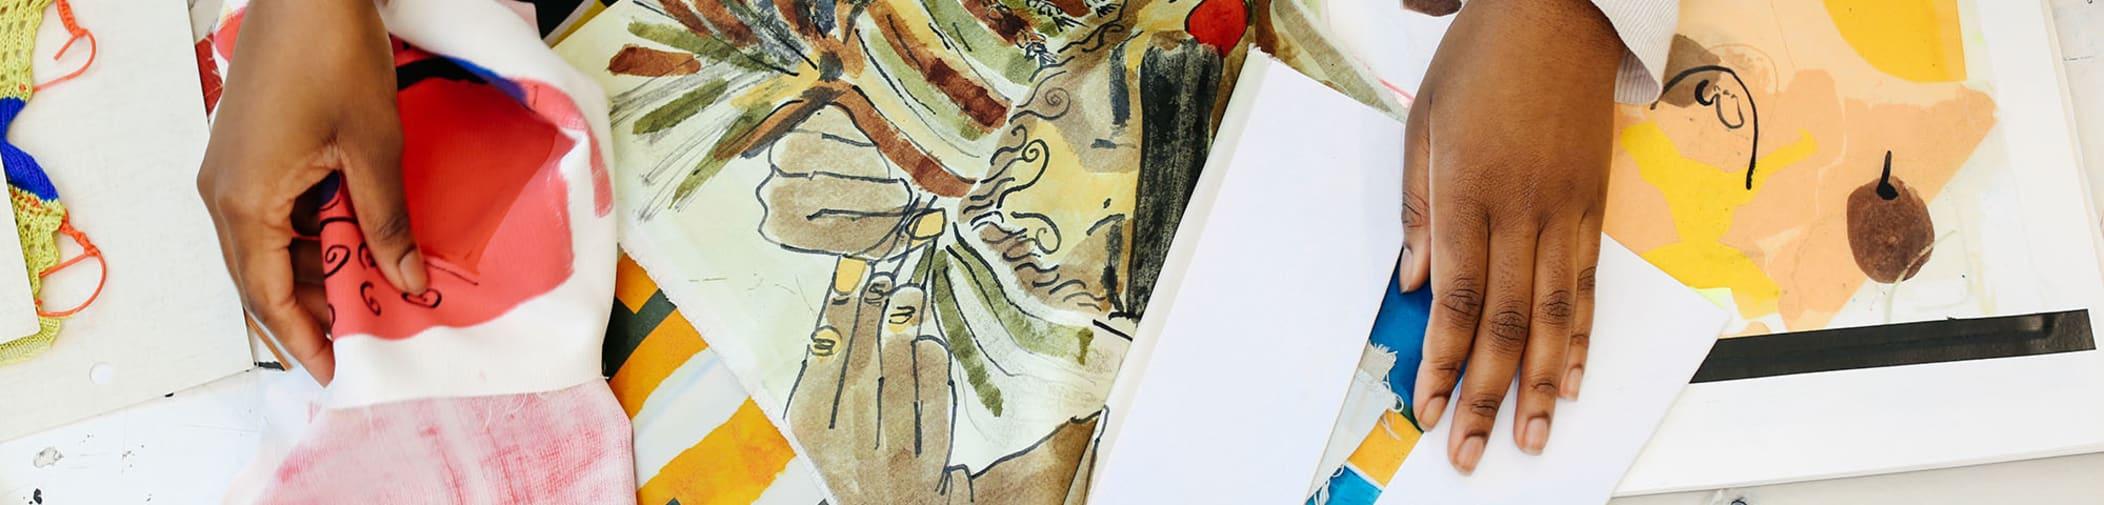 Textile designs by Memunatu Barrie, BA (Hons) Textile Design, Central Saint Martins